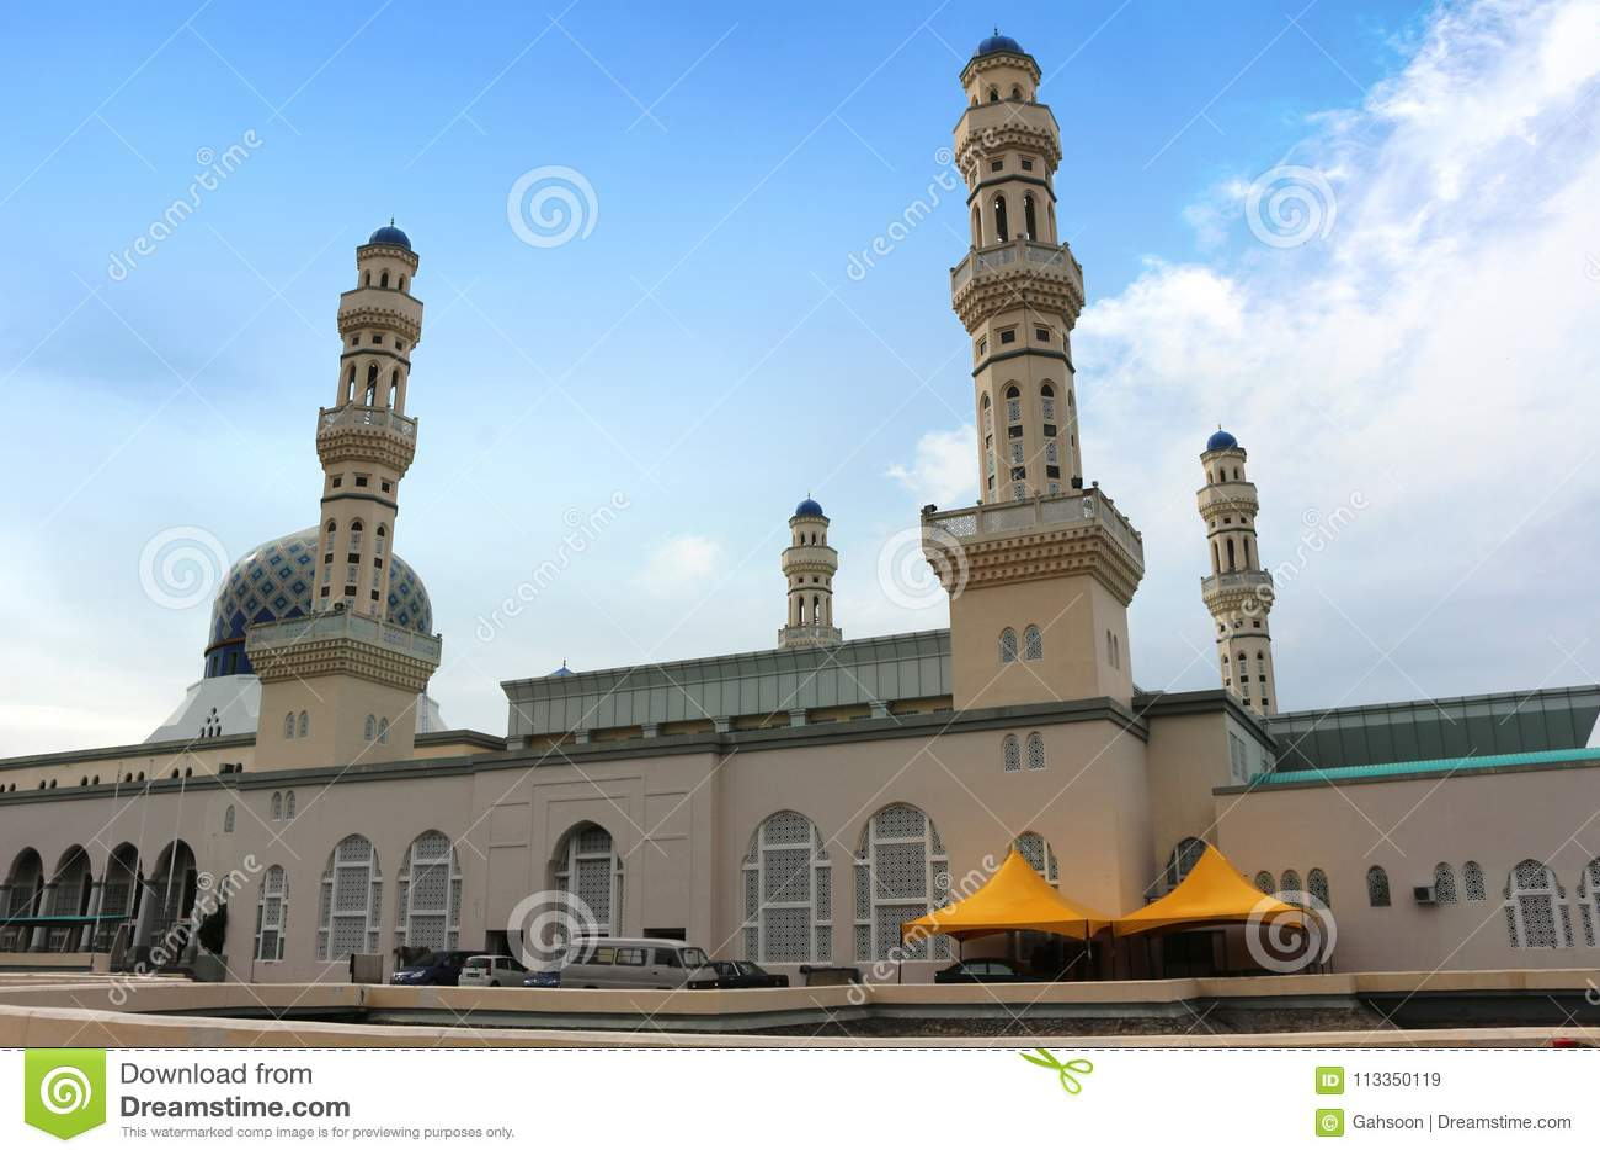 Kota Kinabalu City Floating Mosque chez Sabah Borneo Malaysia